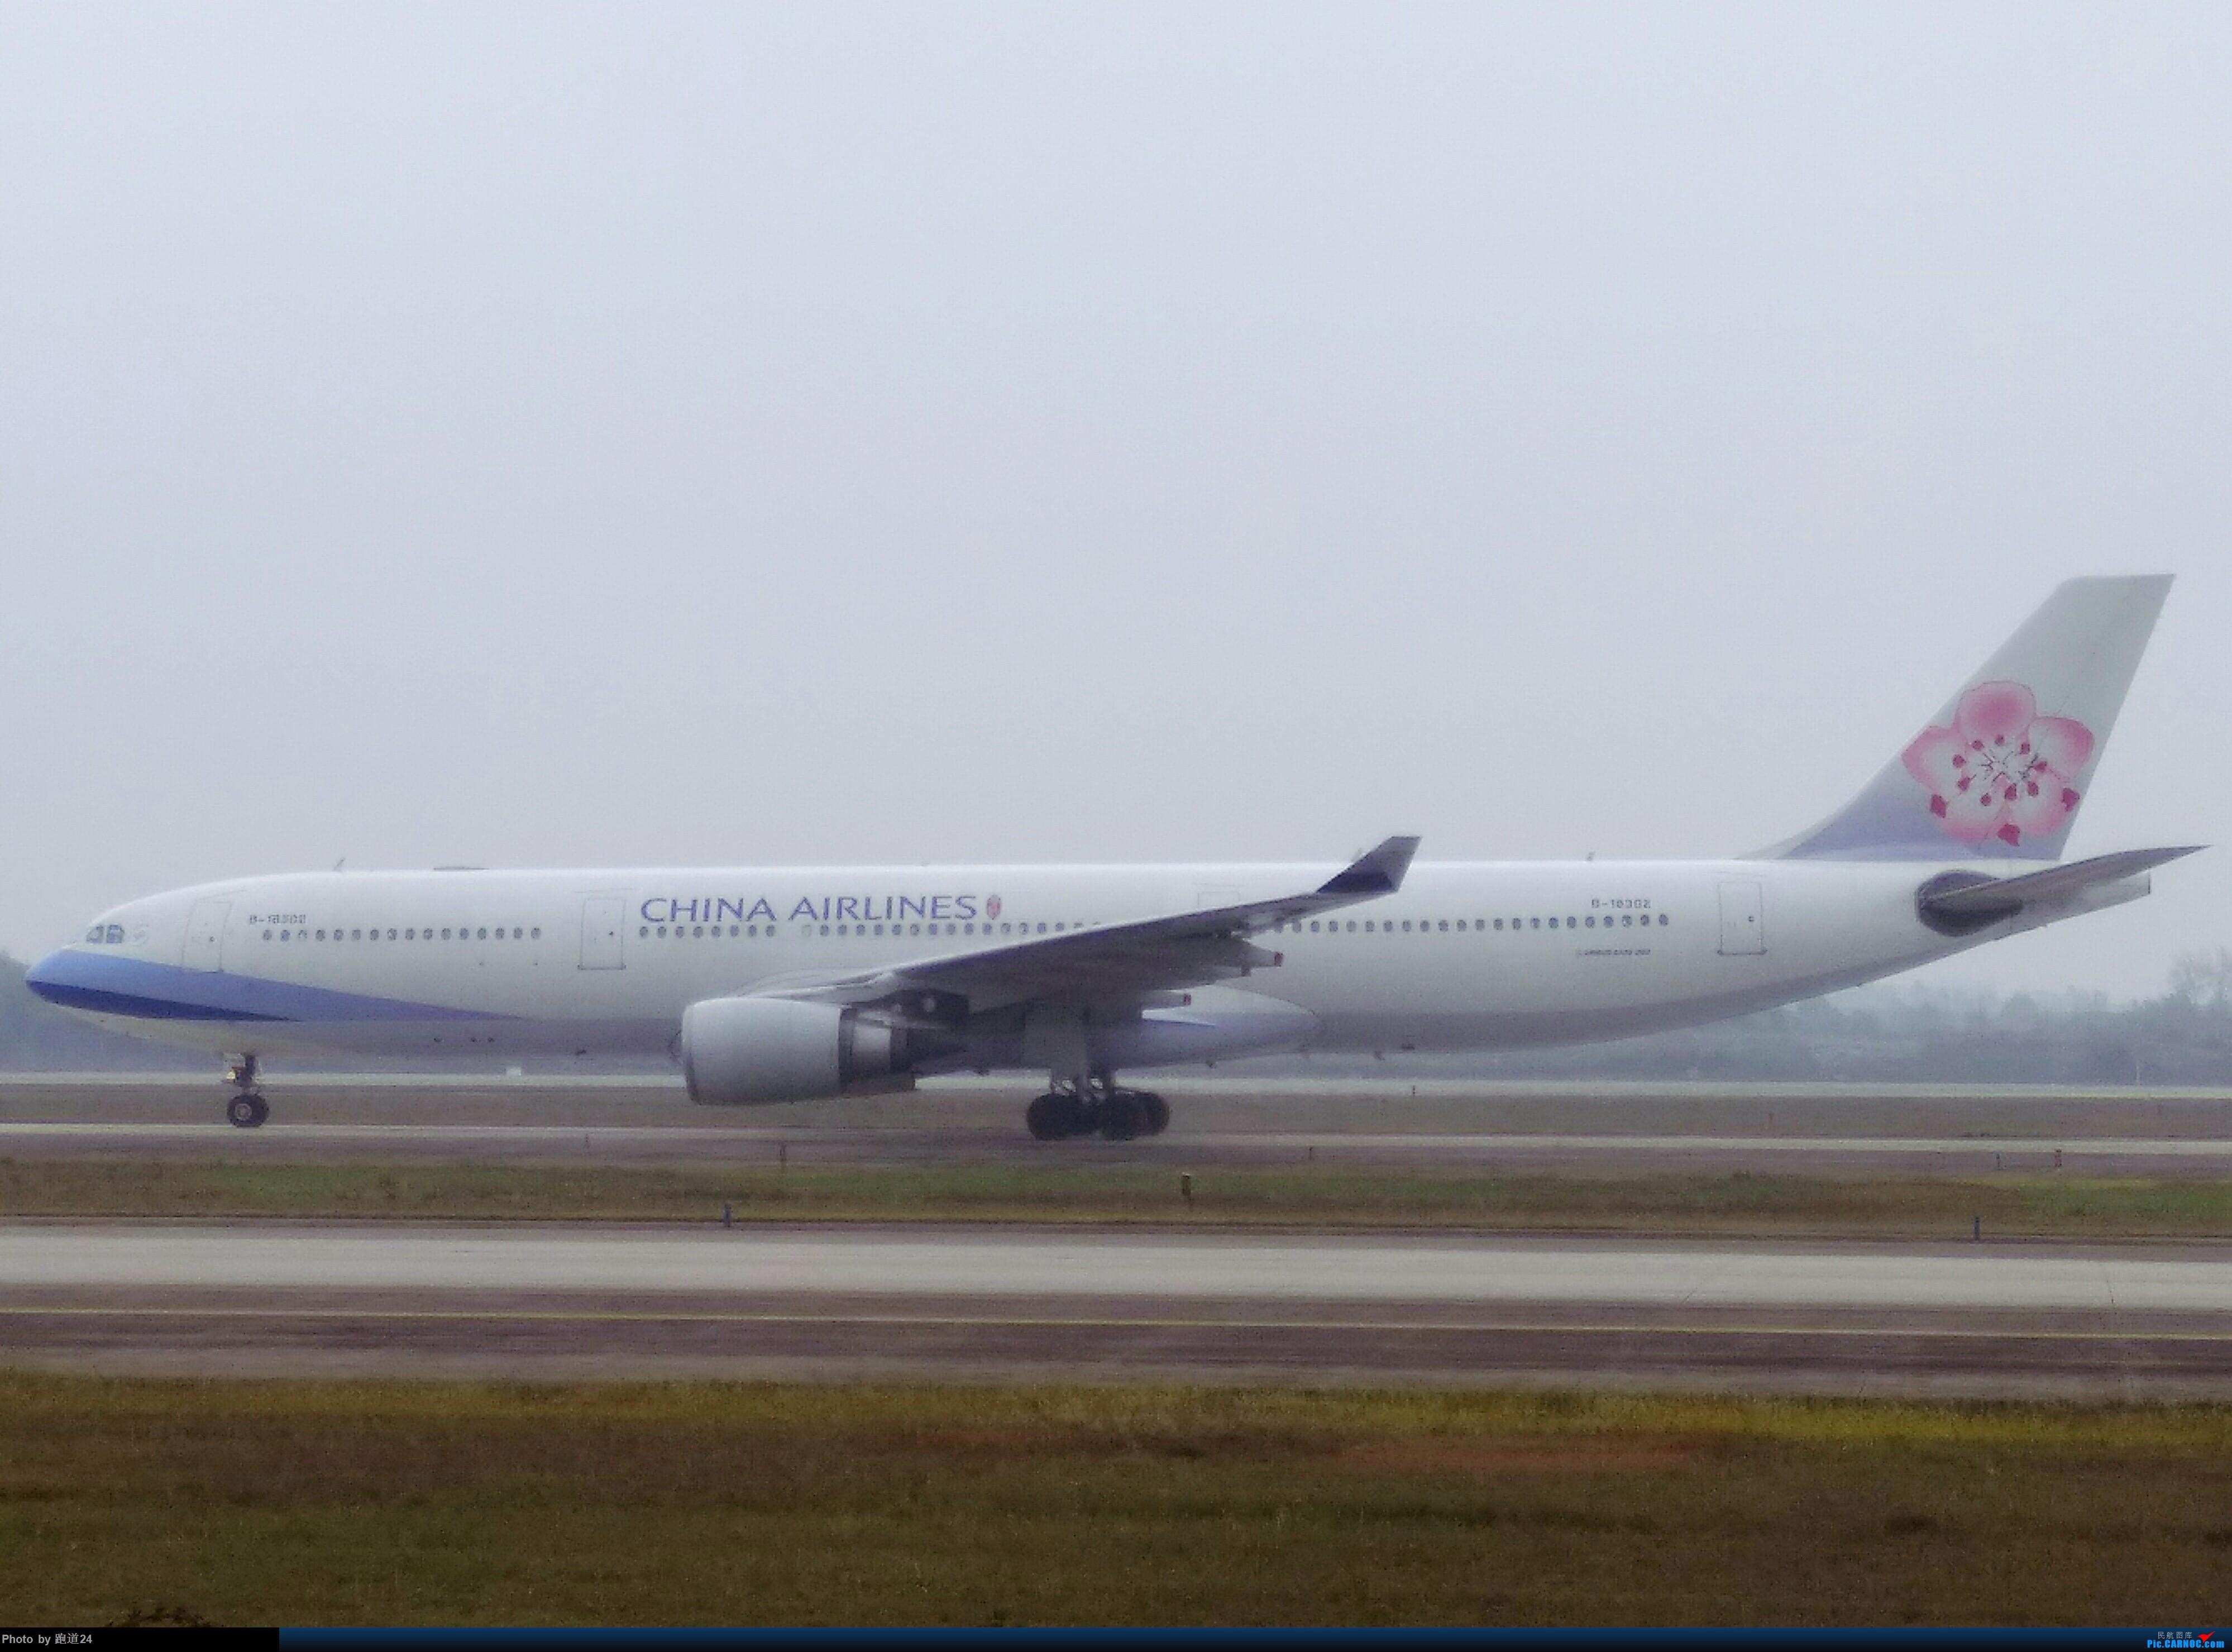 Re:[原创]【多图党】中华航空 A330-302 B-18302 1800*1200 AIRBUS A330-300 B-18302 中国成都双流国际机场